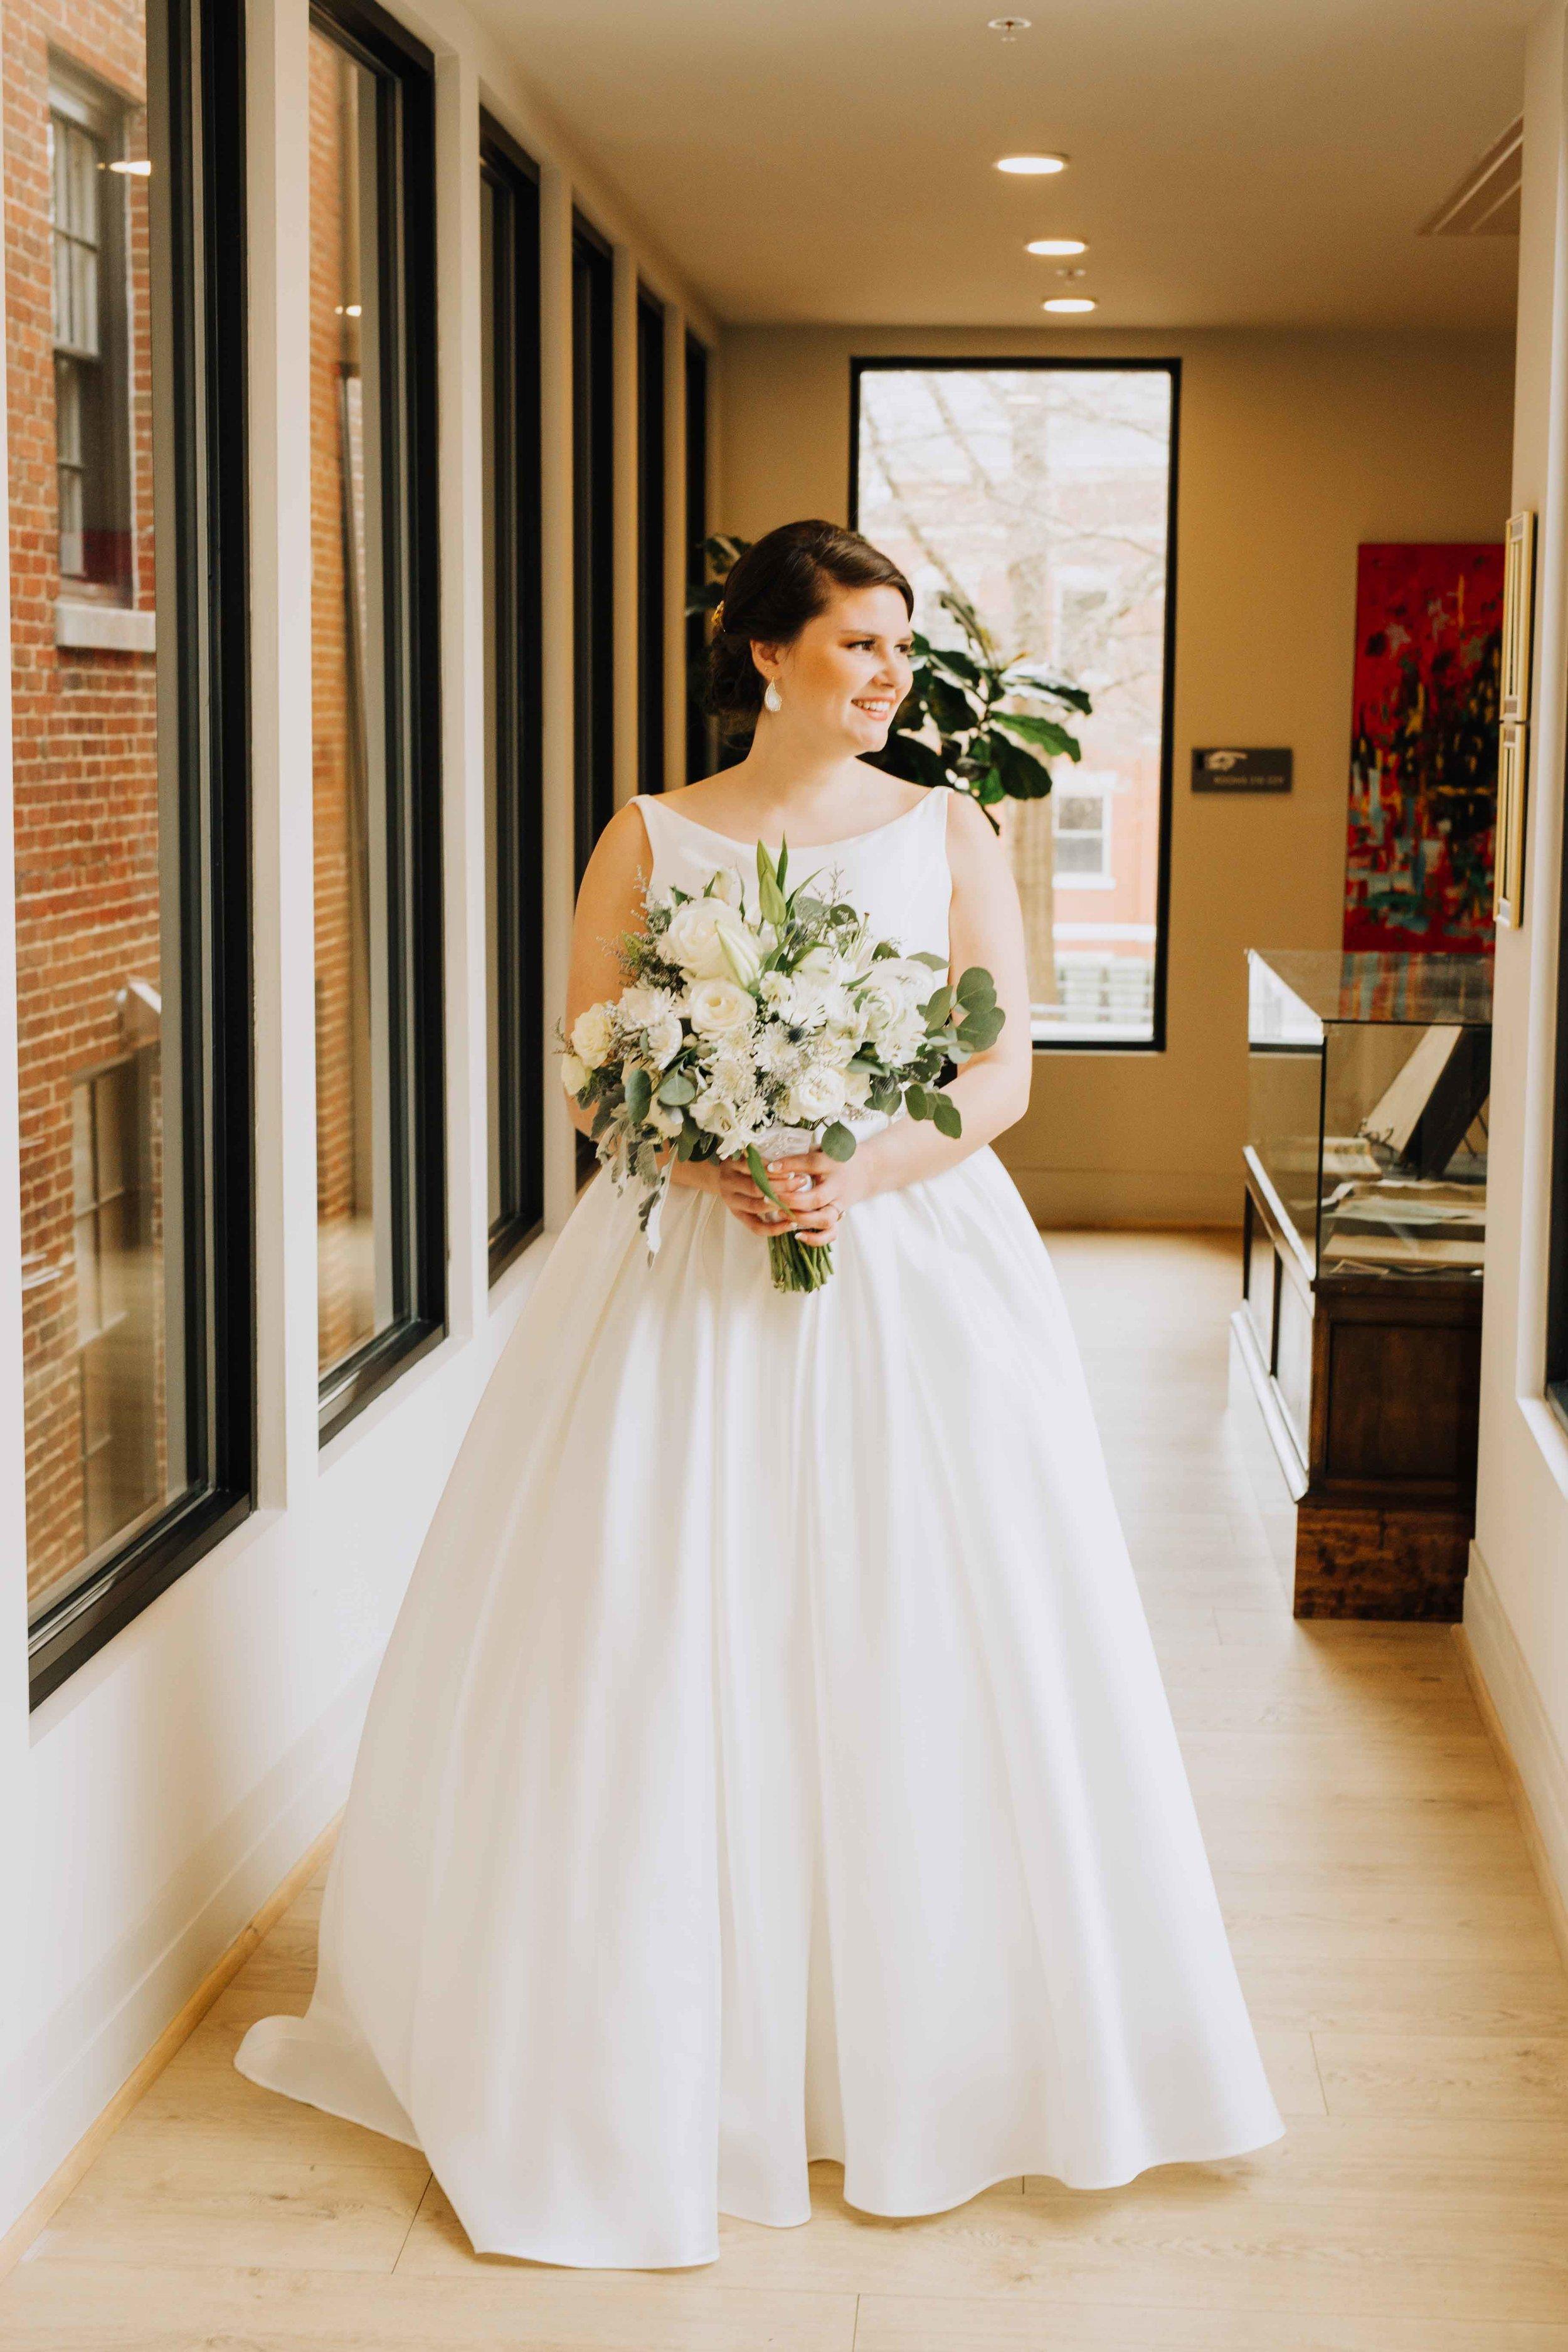 Farmville-Virginia-Wedding-Hotel-Weynoke-Downtown-Jacqueline-Waters-Photography-Detailed- (639).jpg